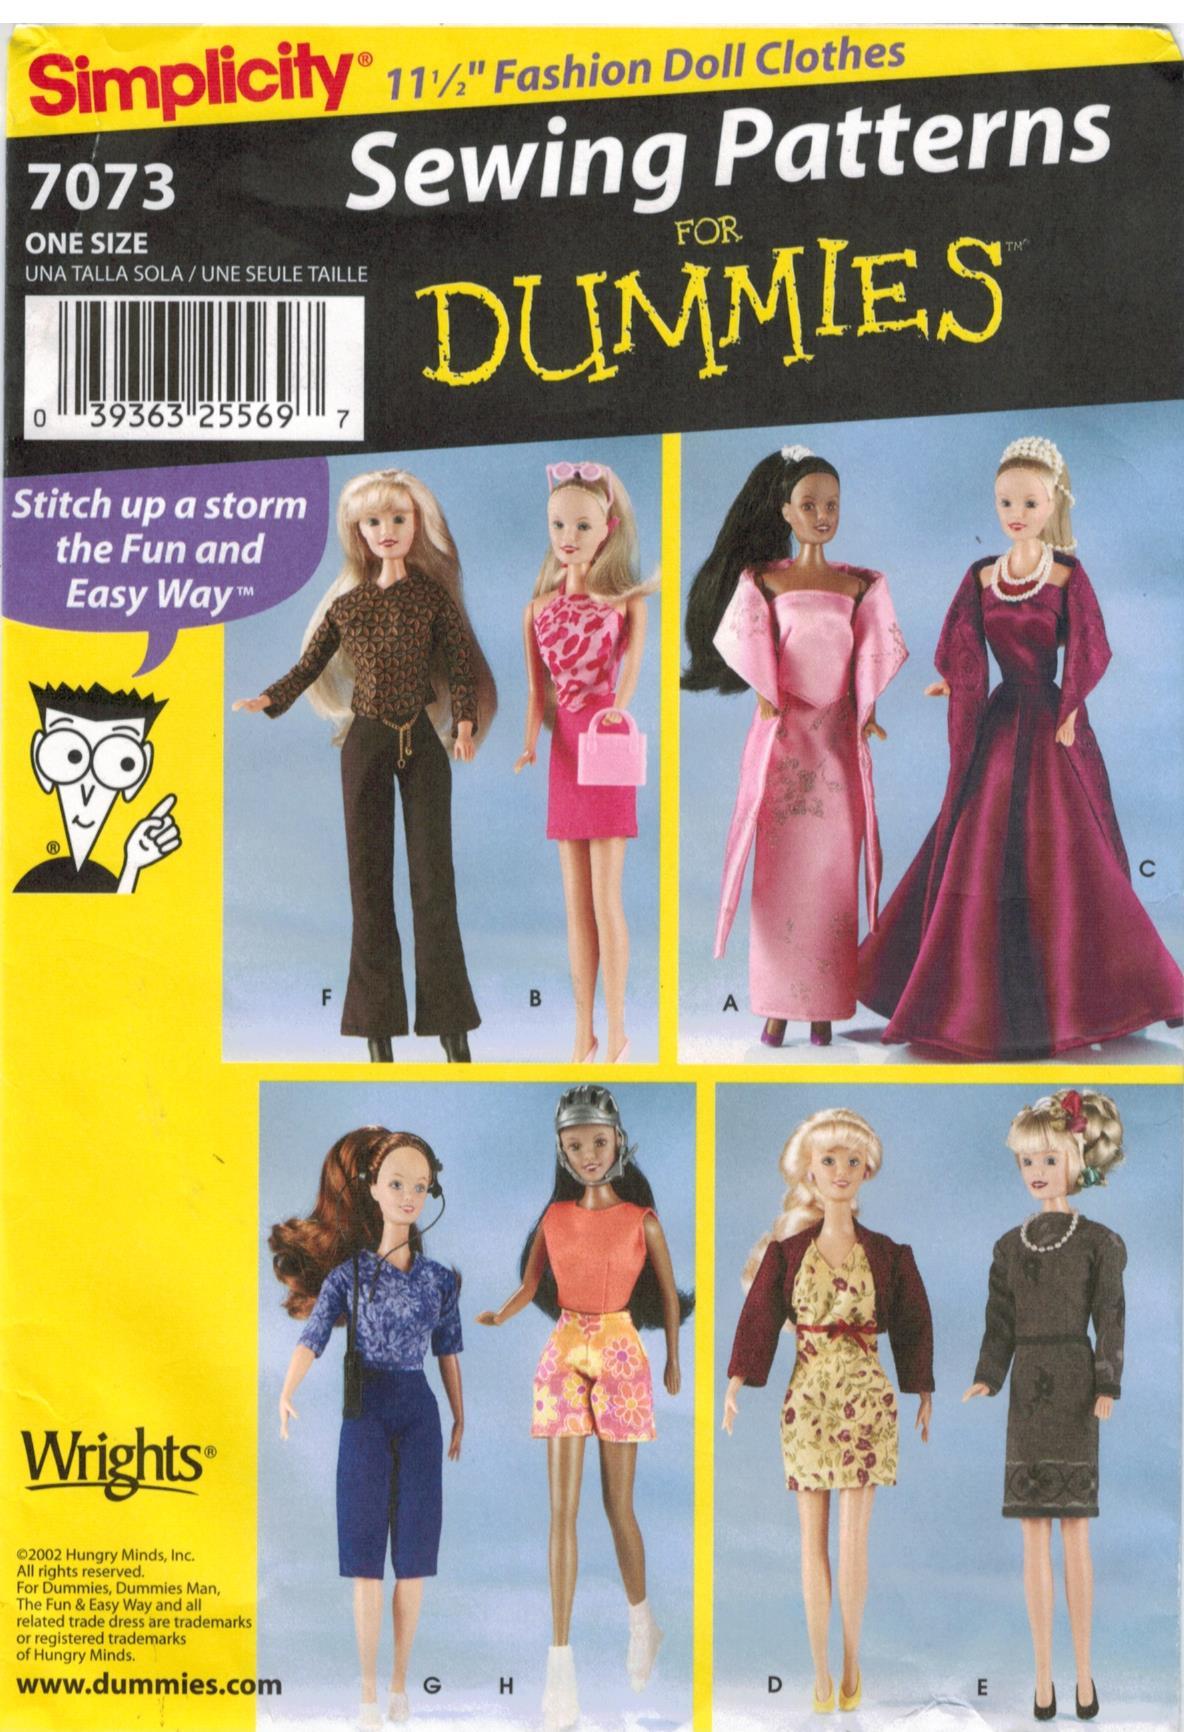 Simplicity Pattern 7073 Fashion Doll Wardrobe for Barbie size dolls